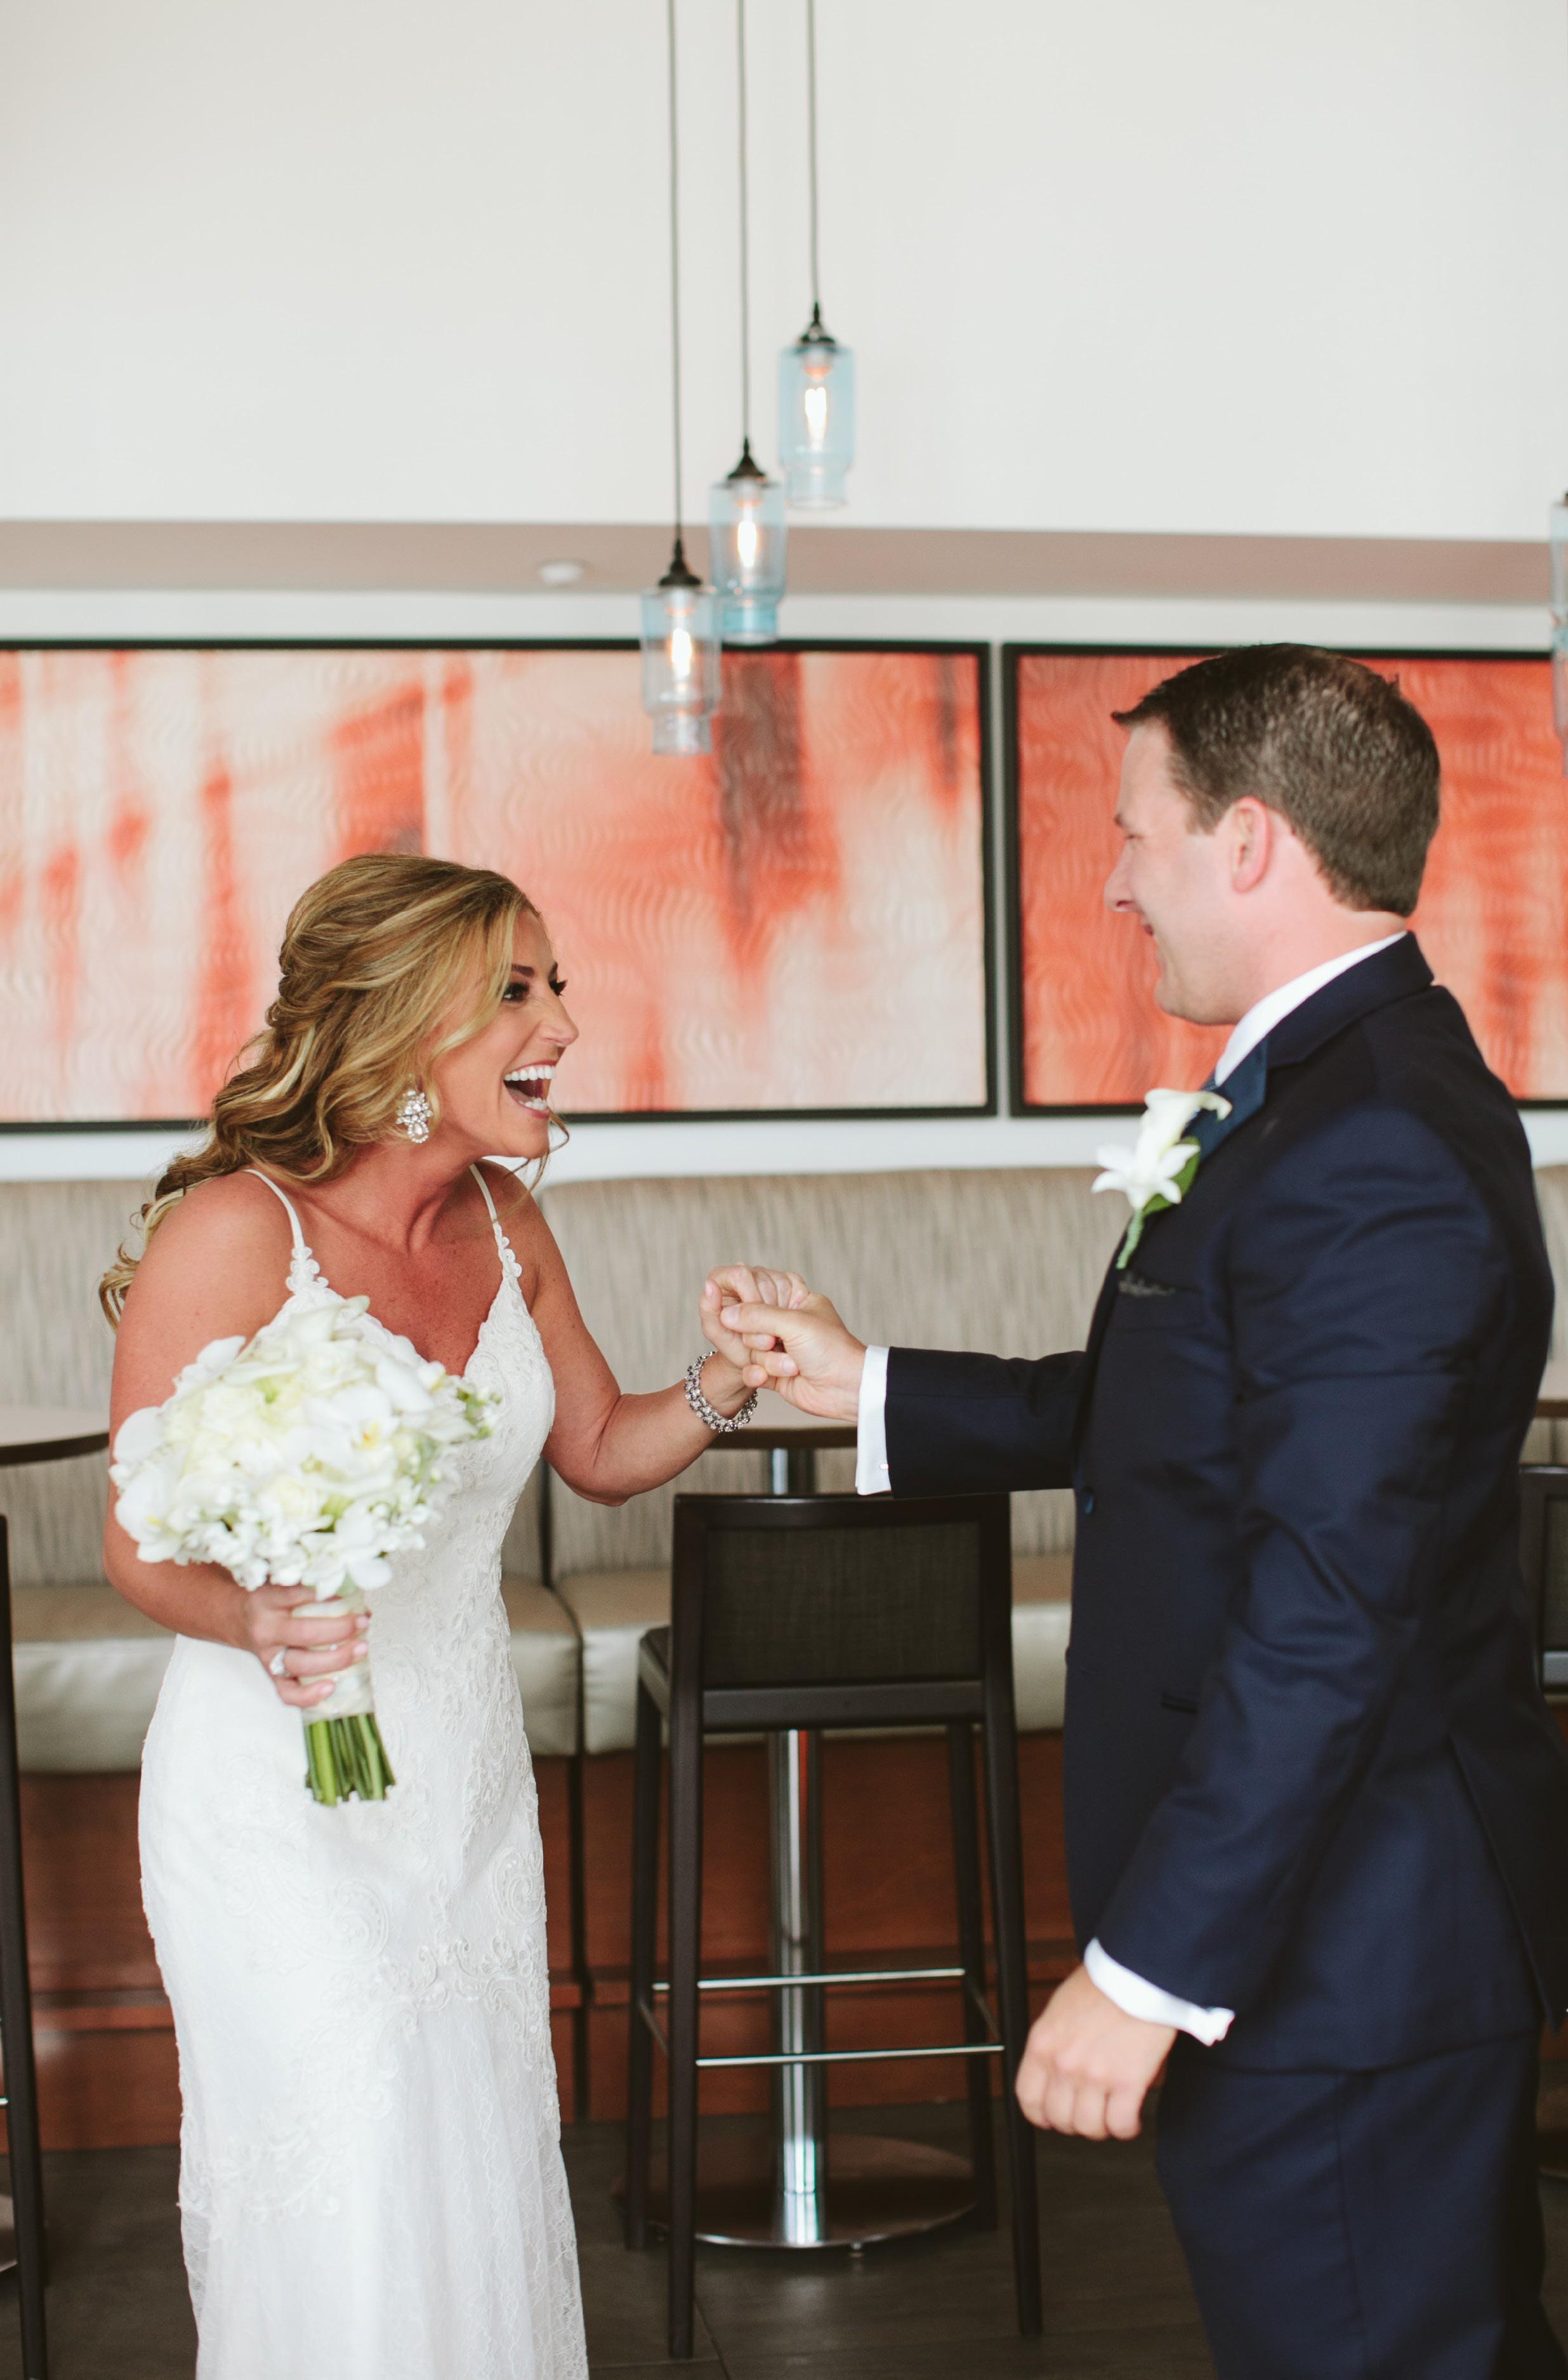 Kim + John's Wedding at the Waterstone Hotel in Boca Raton22.jpg